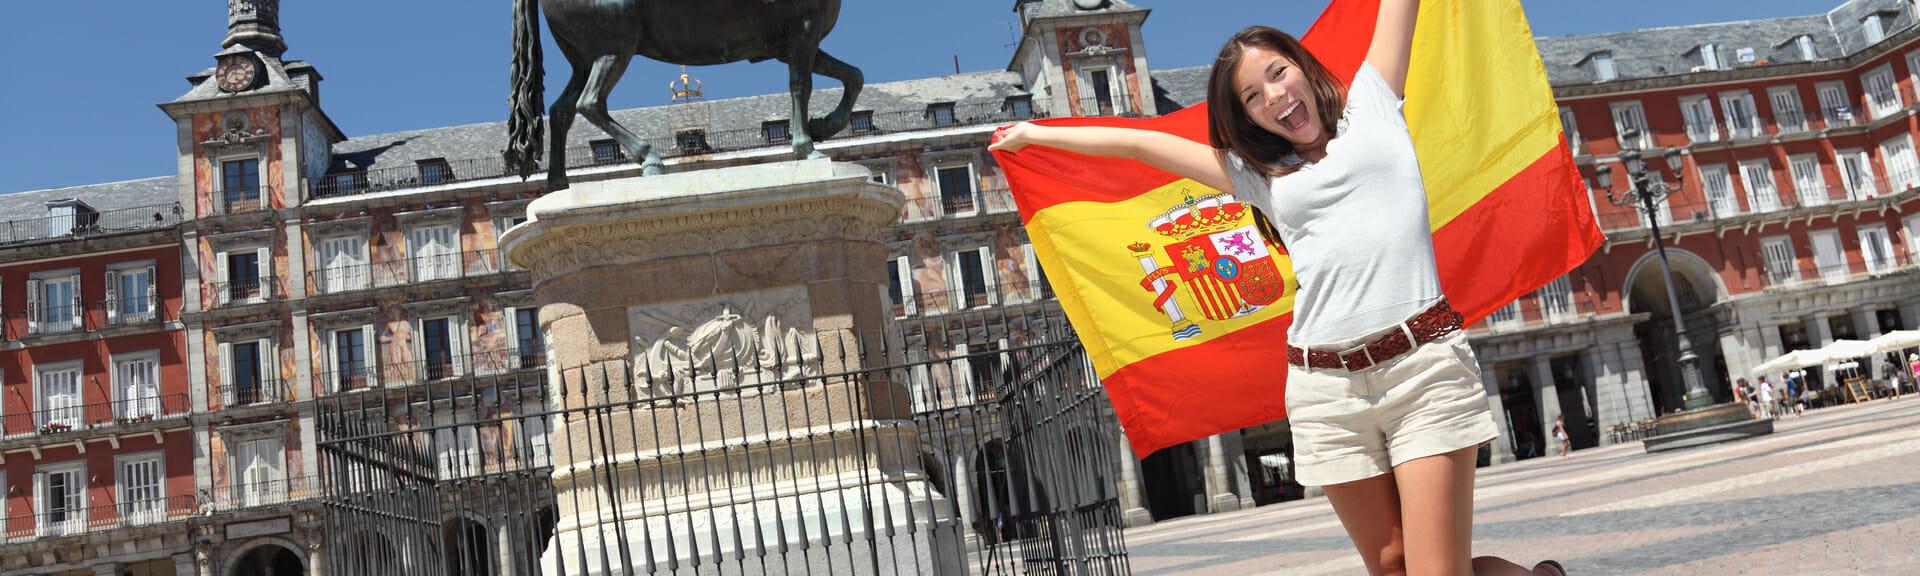 Klassenfahrt Madrid begeisterte Schülerin